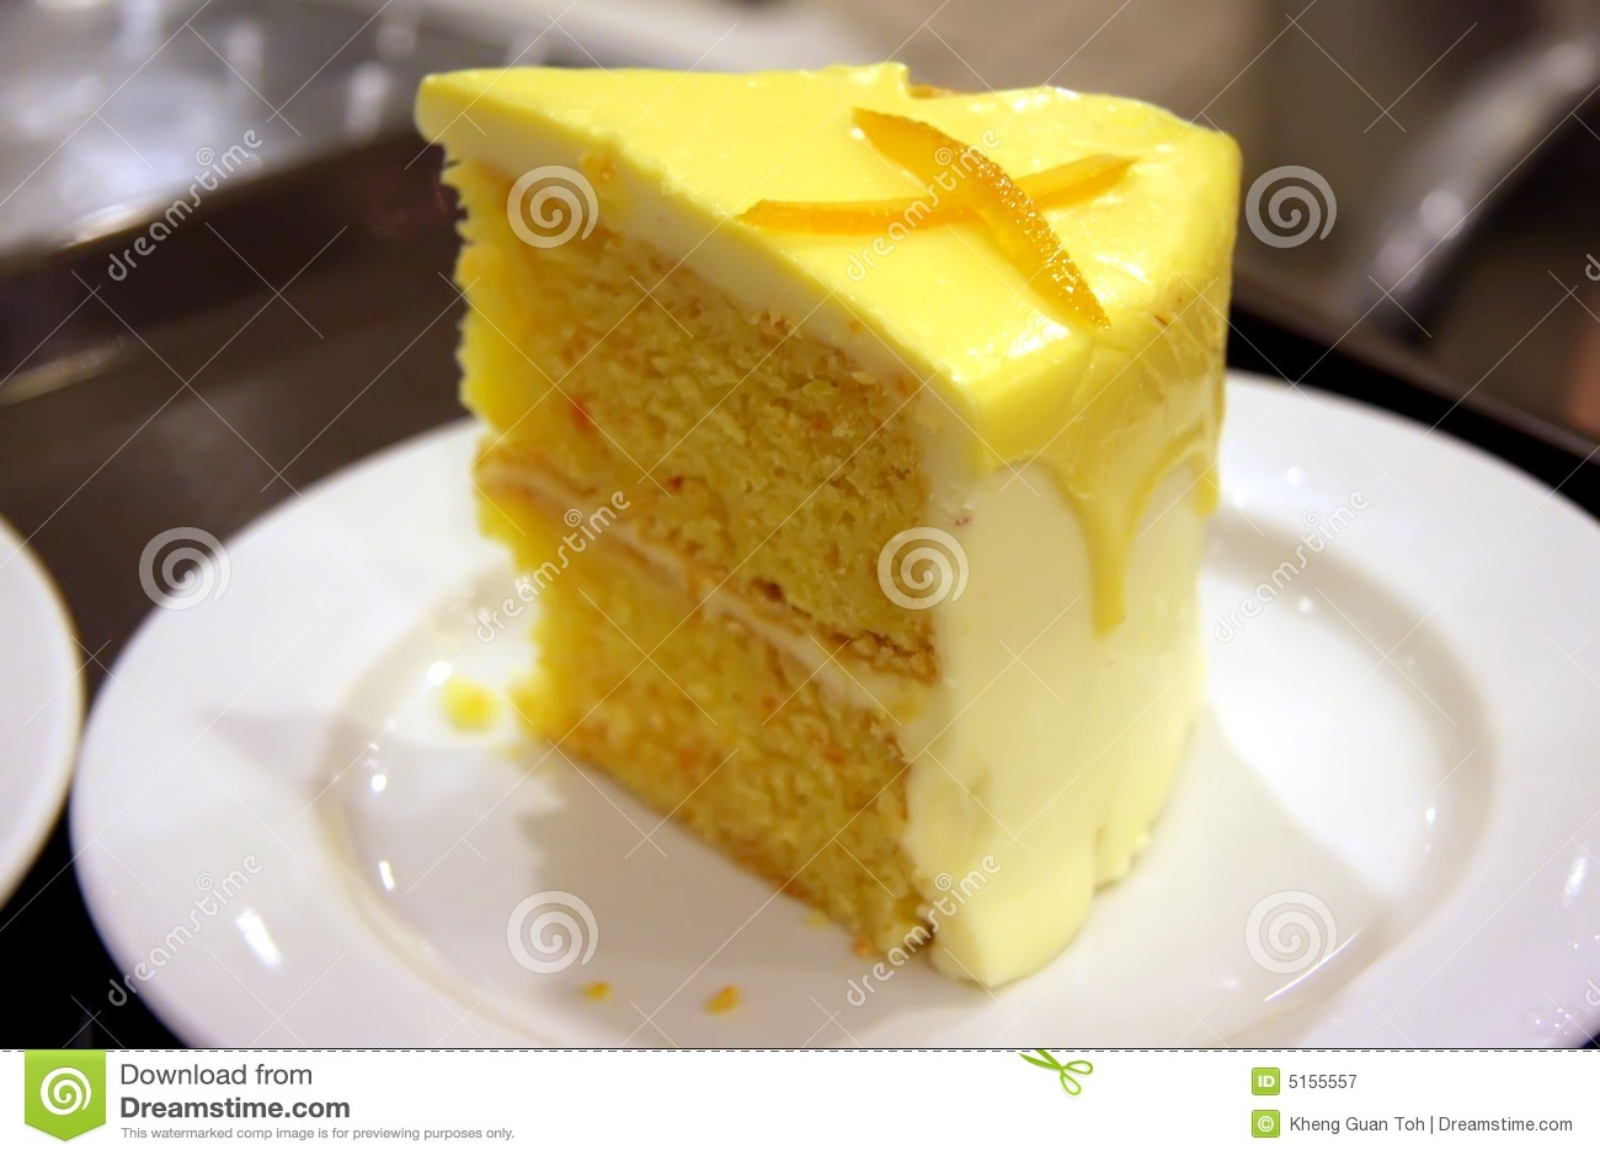 Lemon Bundt Cake Decorating